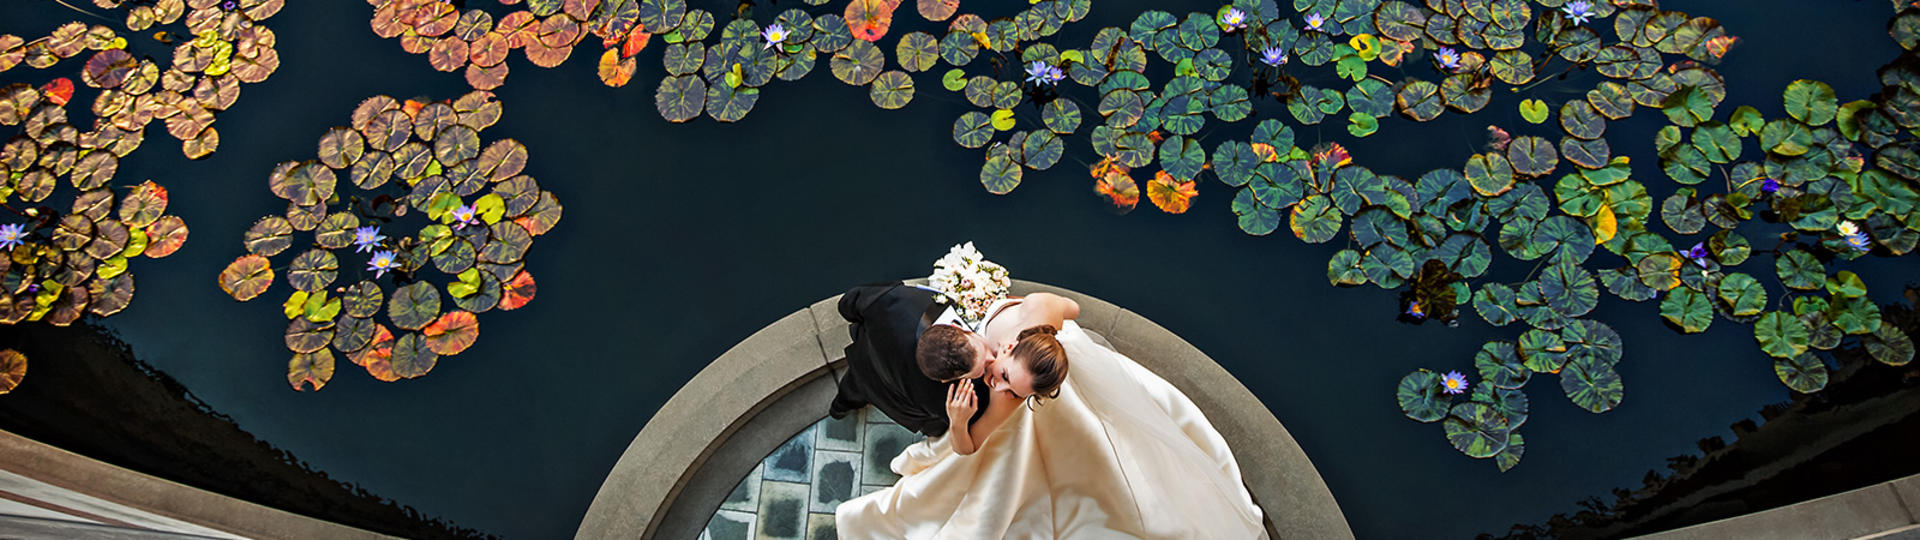 Plan an Event Wedding Image